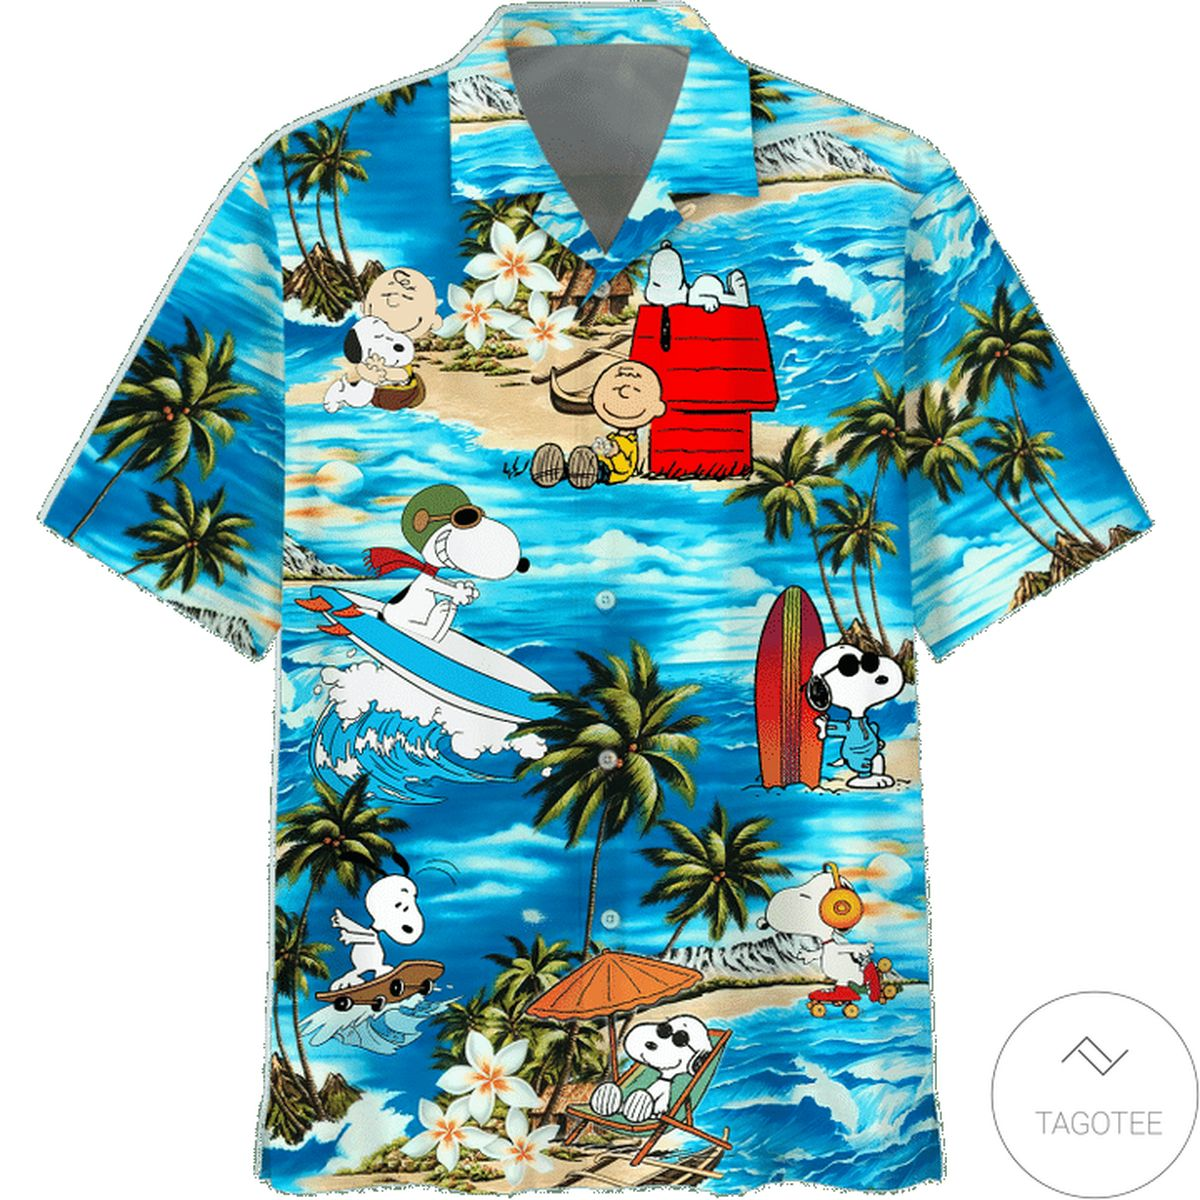 Snoopy And Charlie Brown The Peanuts Movie Aloha Hawaiian Shirt